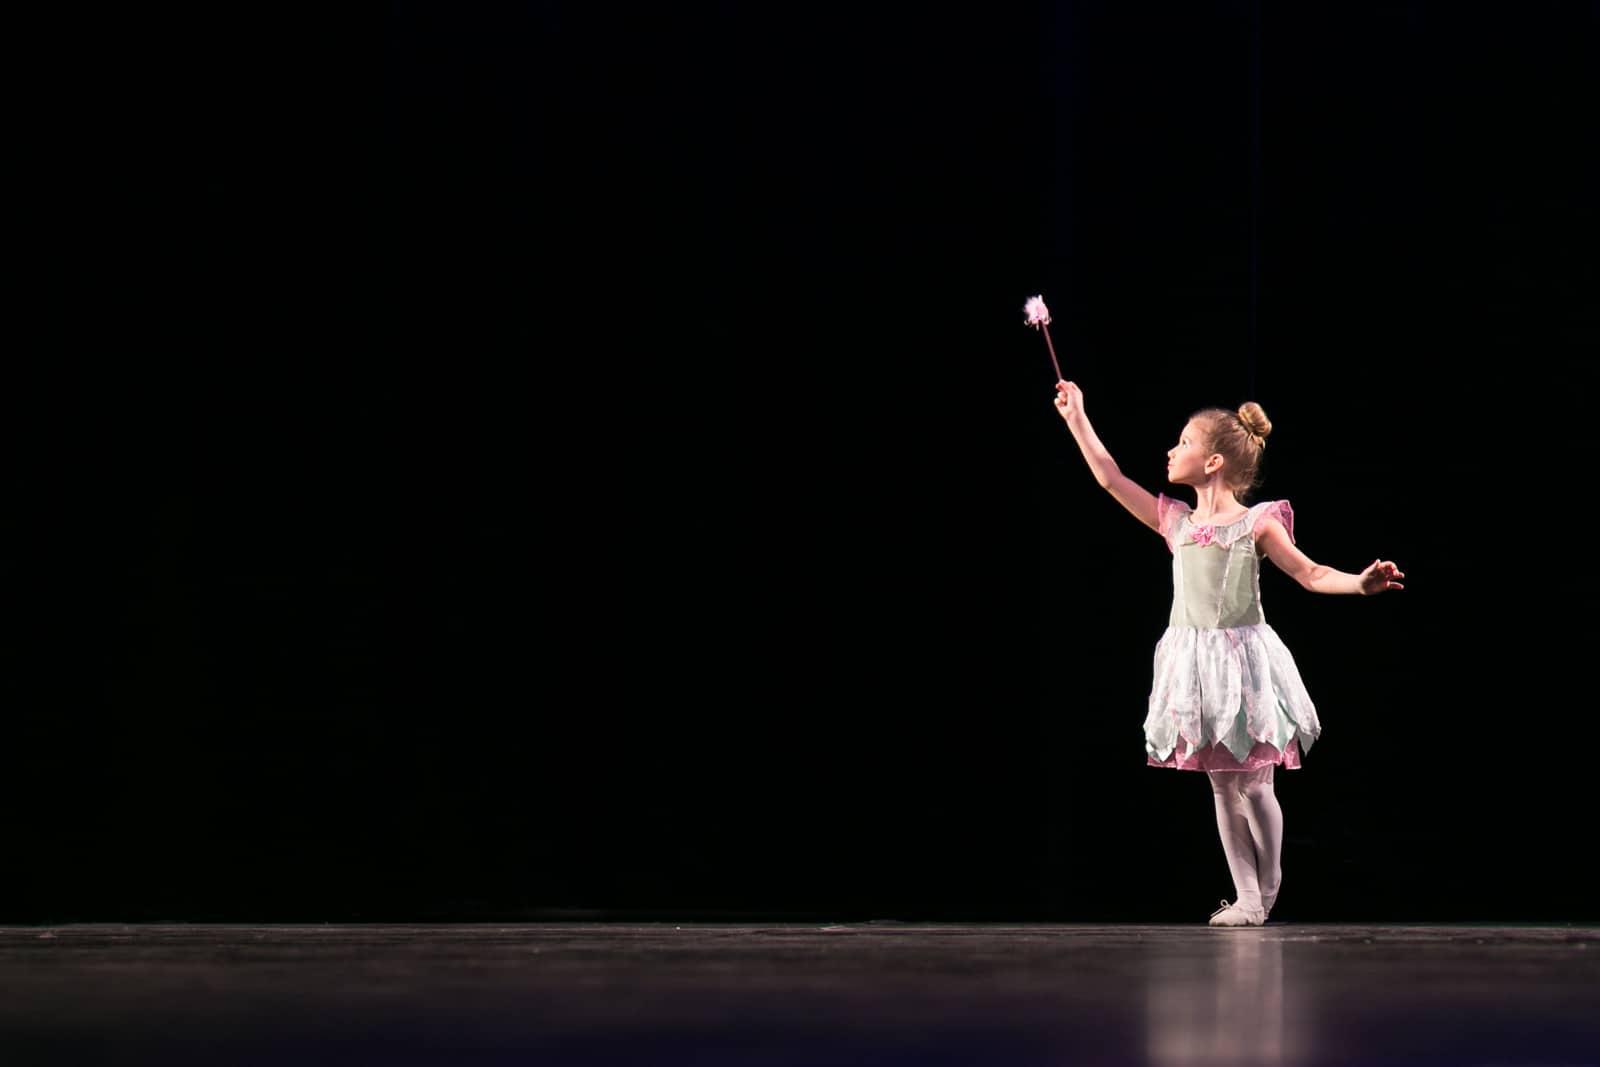 Austrian Dance Cup 2015 in Bad Ischl, Tanzsport, Christiane Eckl Photography